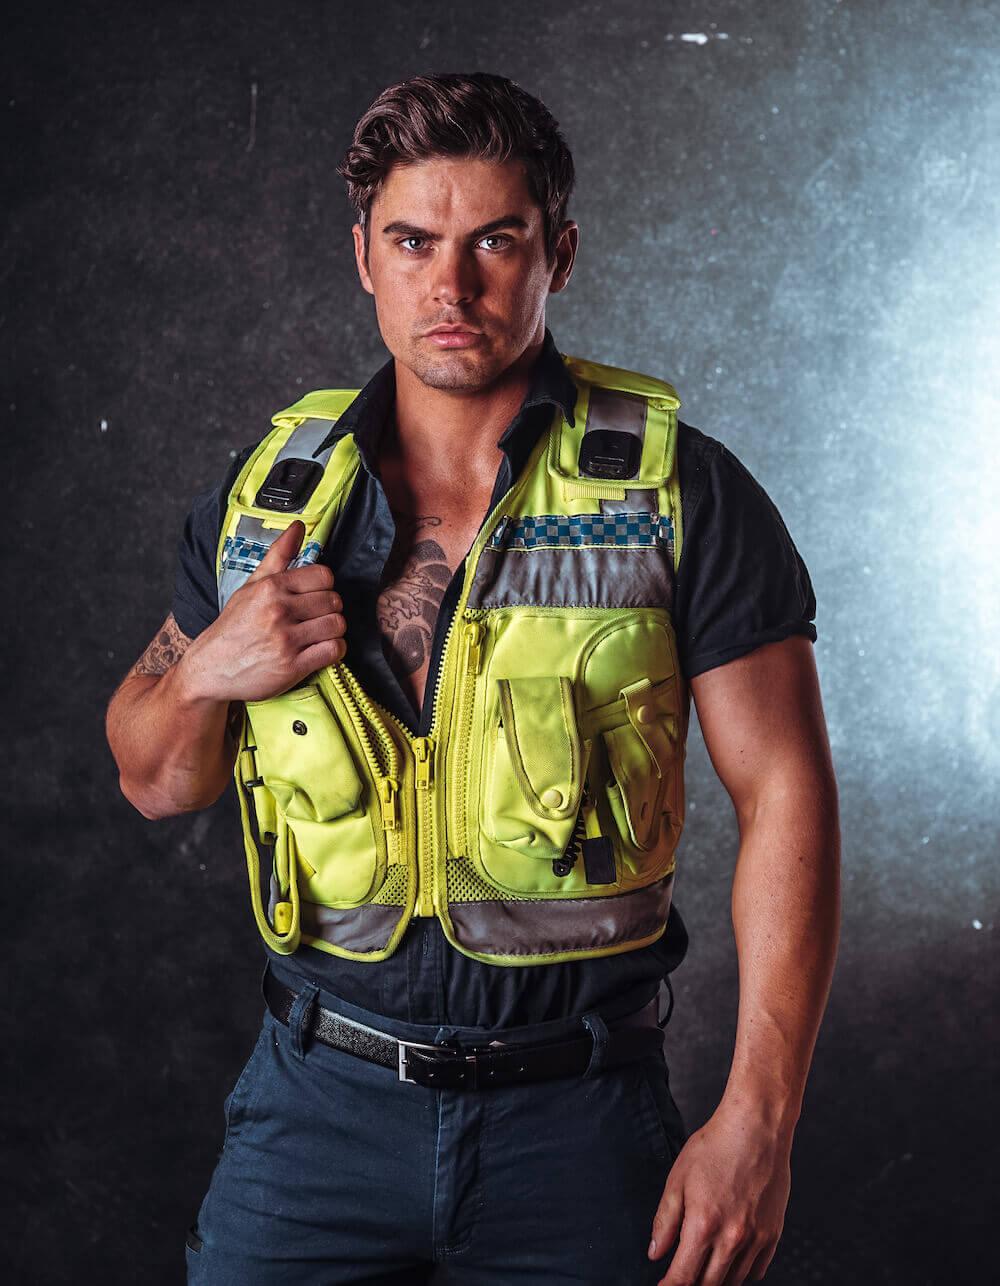 Policeman Stripper Zac